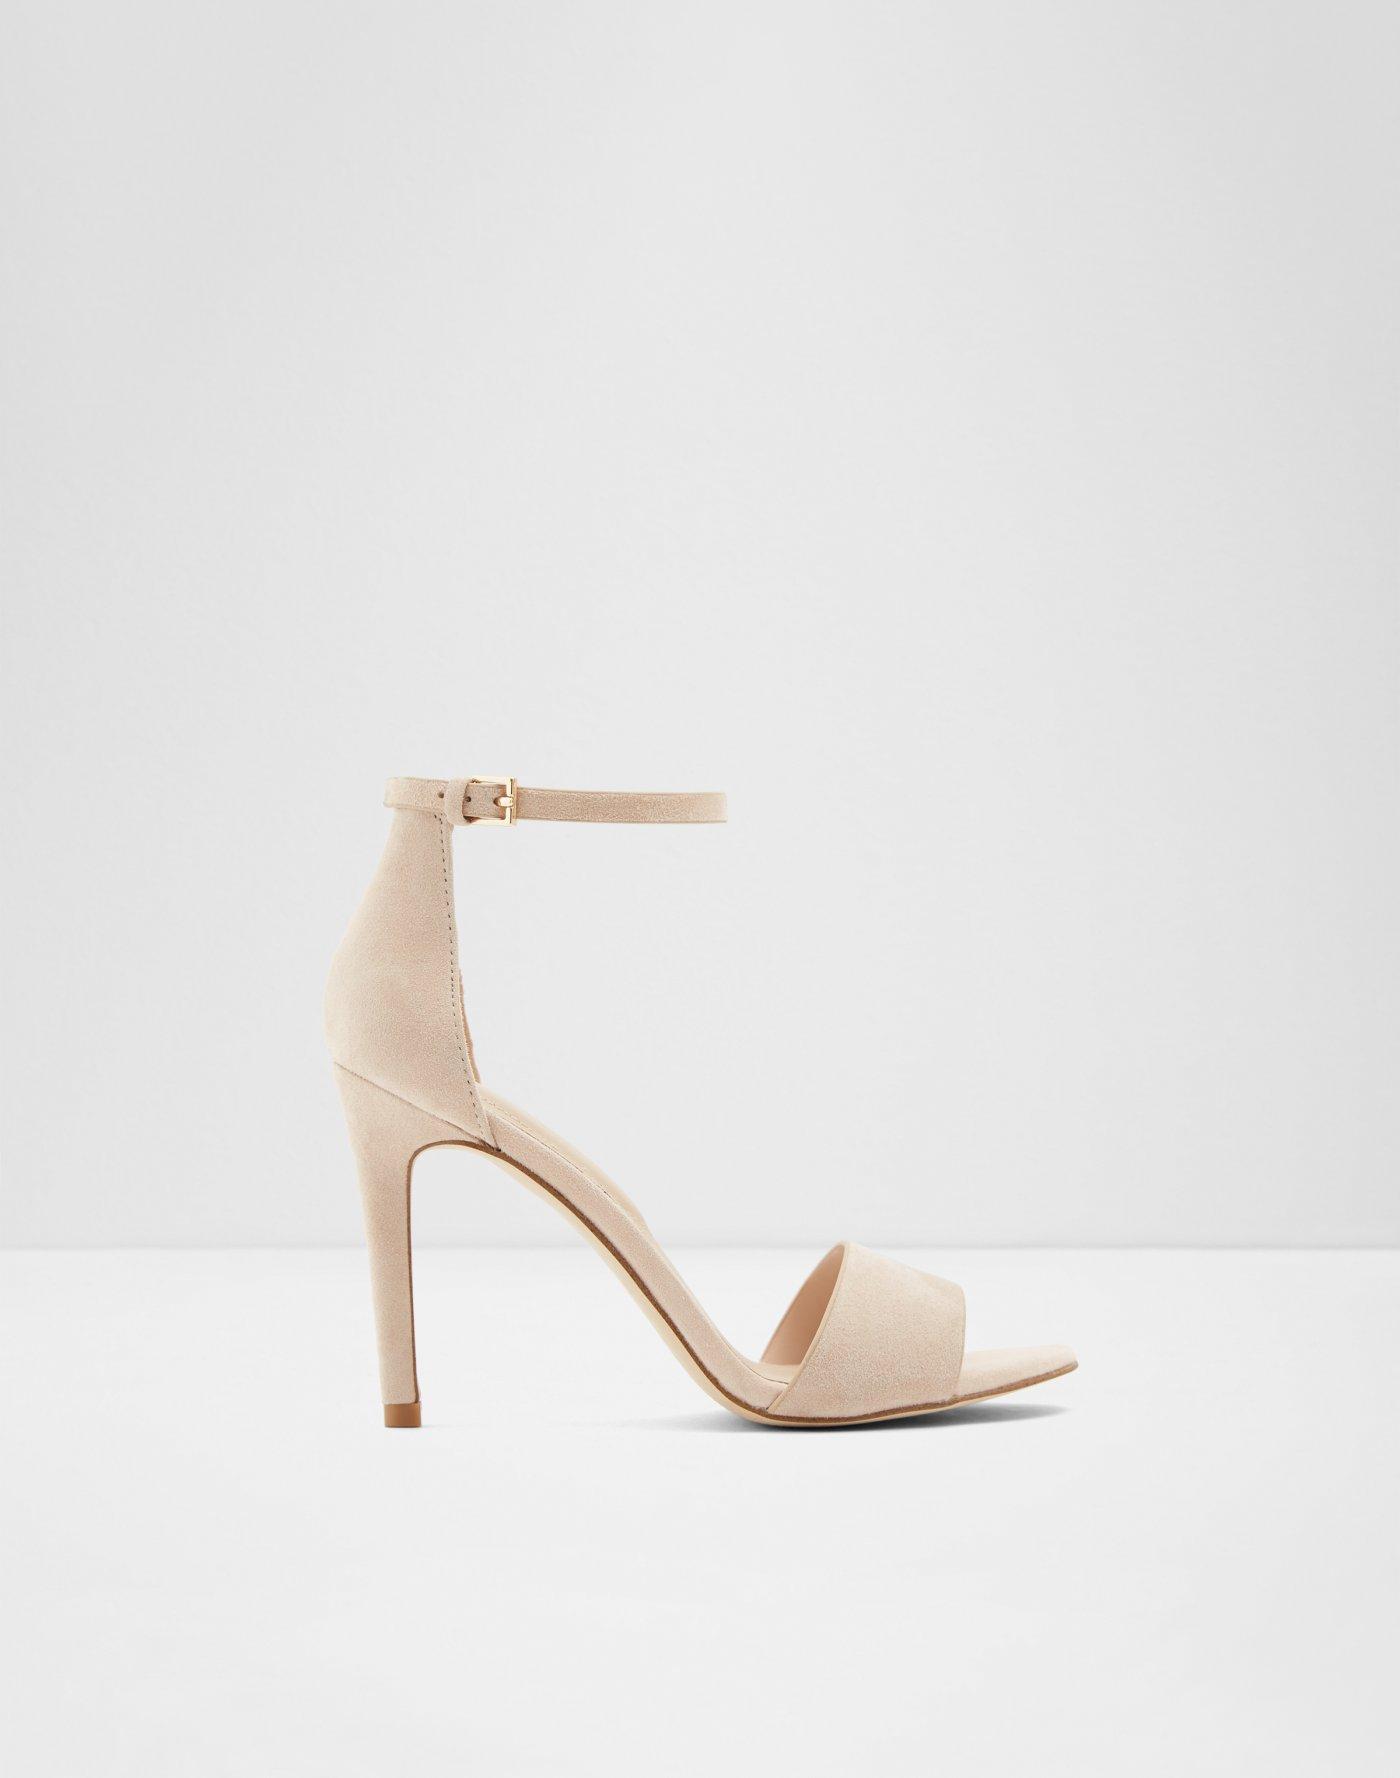 eedfd4e7c00 Heeled Sandals | Women Sandals | ALDO US | Aldoshoes.com US